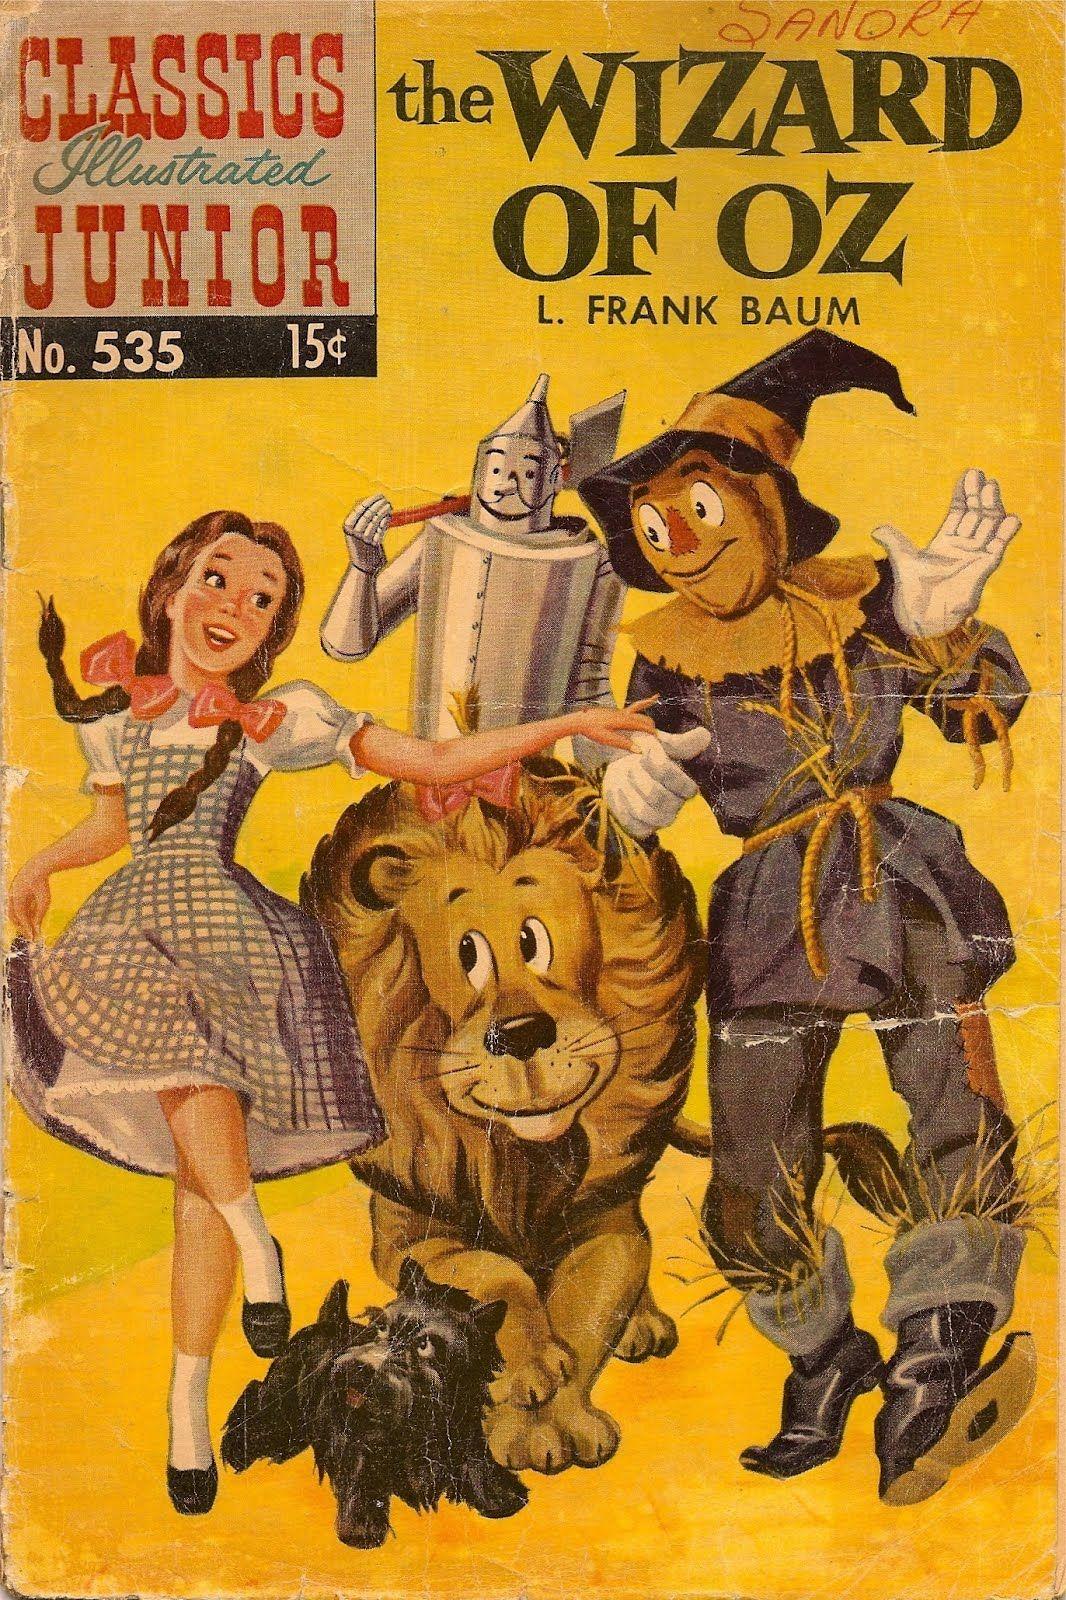 Classics Illustrated Junior The Wizard Of Oz Wizard Of Oz Book Wizard Of Oz Wizard Of Oz Movie